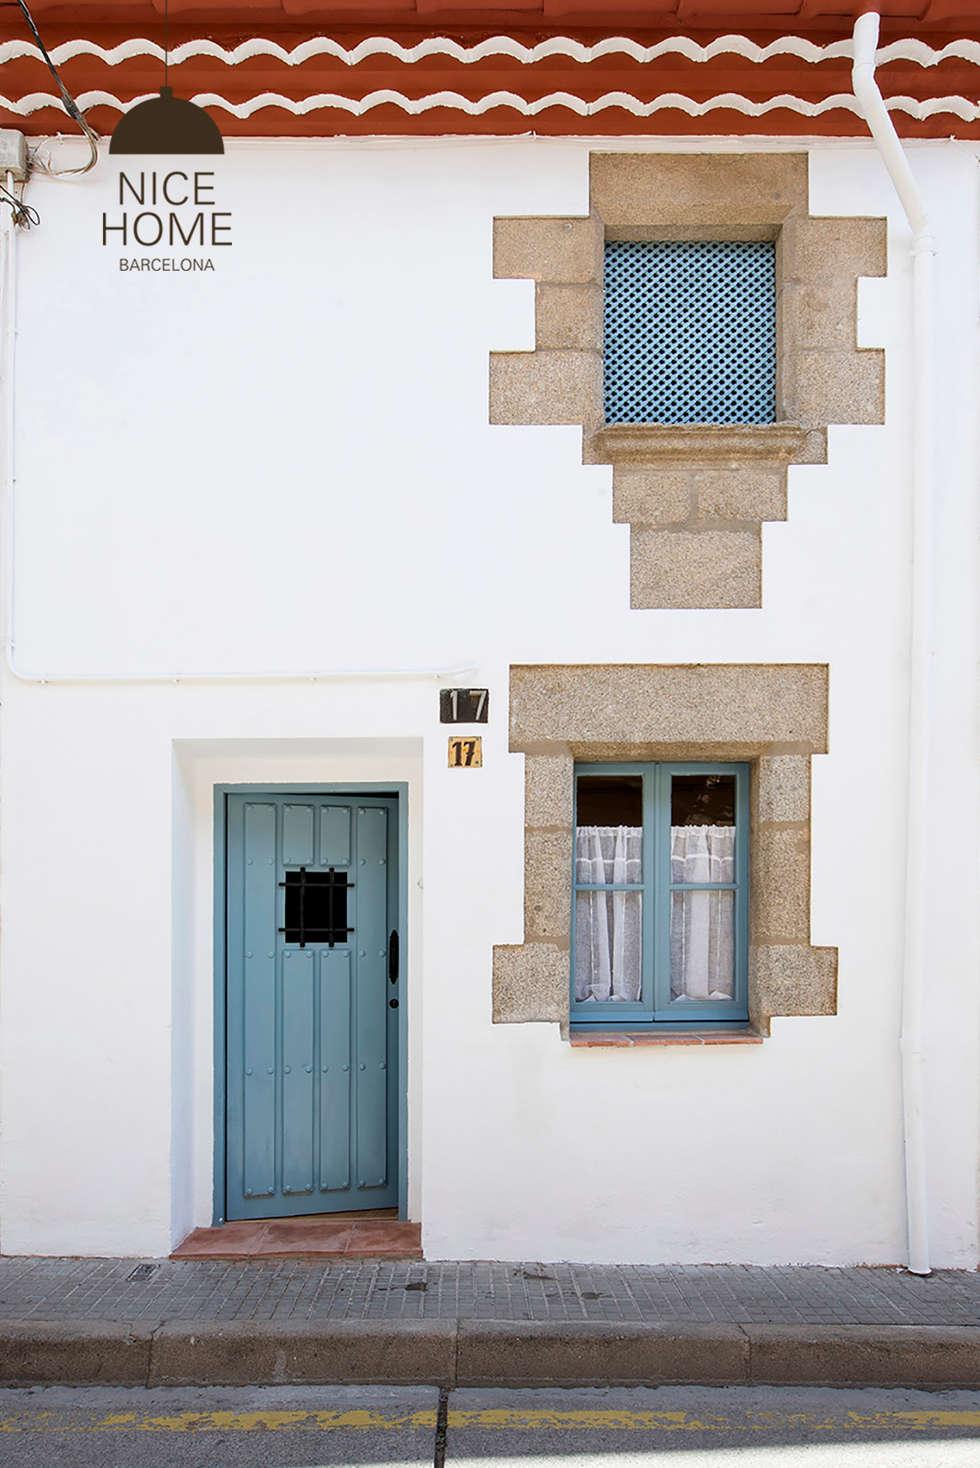 Ph ng thi t k n i th t b tr nh homify - Nice home barcelona ...